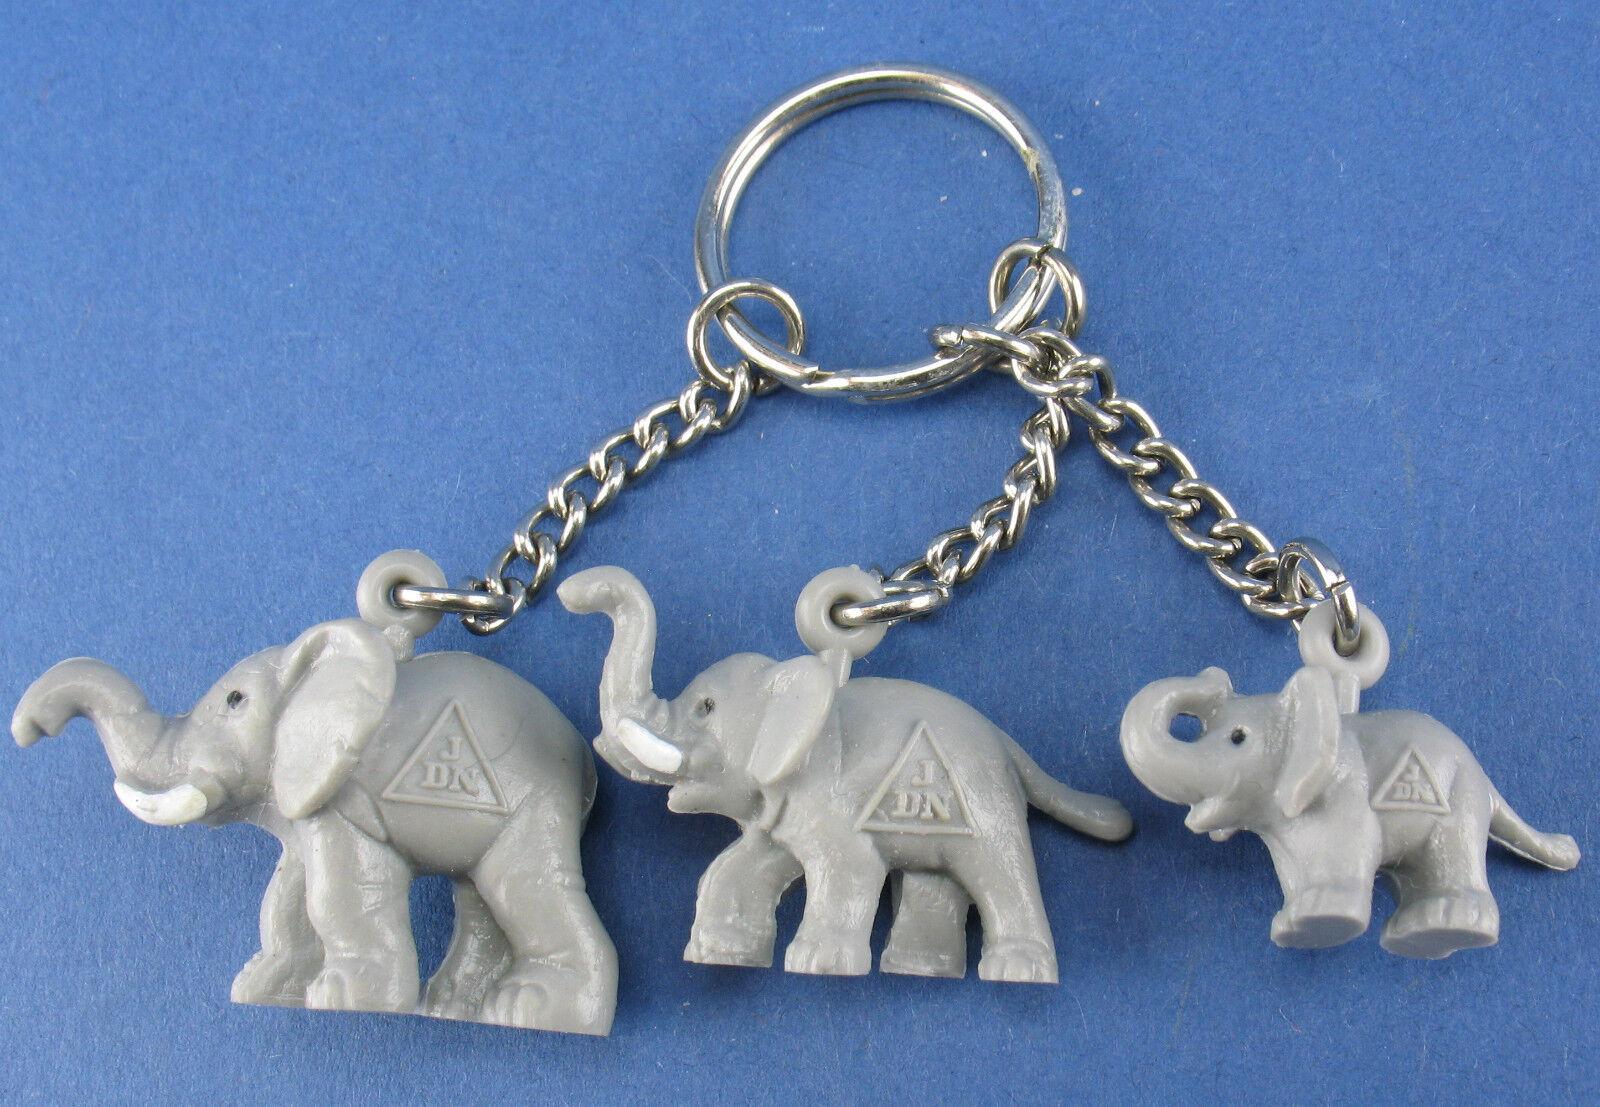 Schleich - 3x mini elefantes - 1,7 - 2,5 cm-JDN werbeFiguran-personaje minis